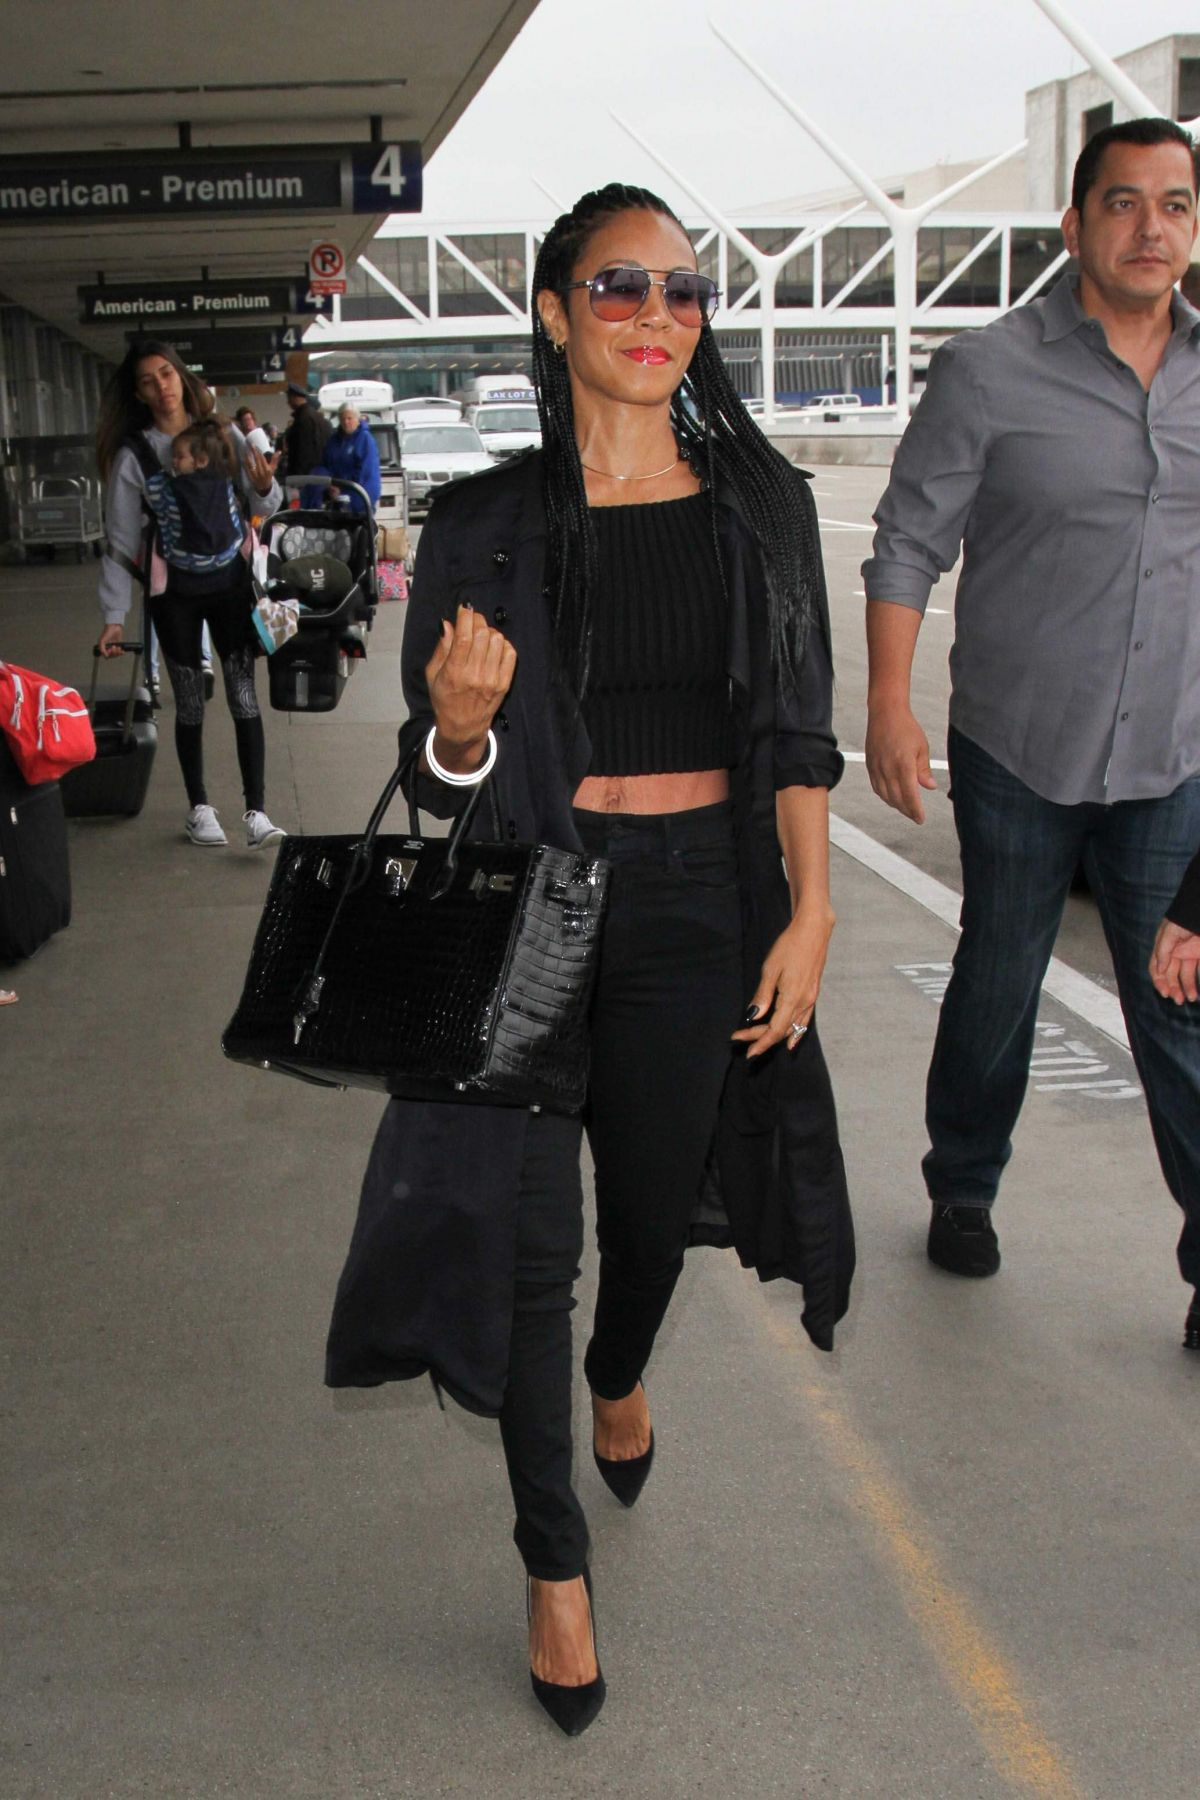 JADA PINKETT SMITH at Los Angeles International Airport 05/10/2016